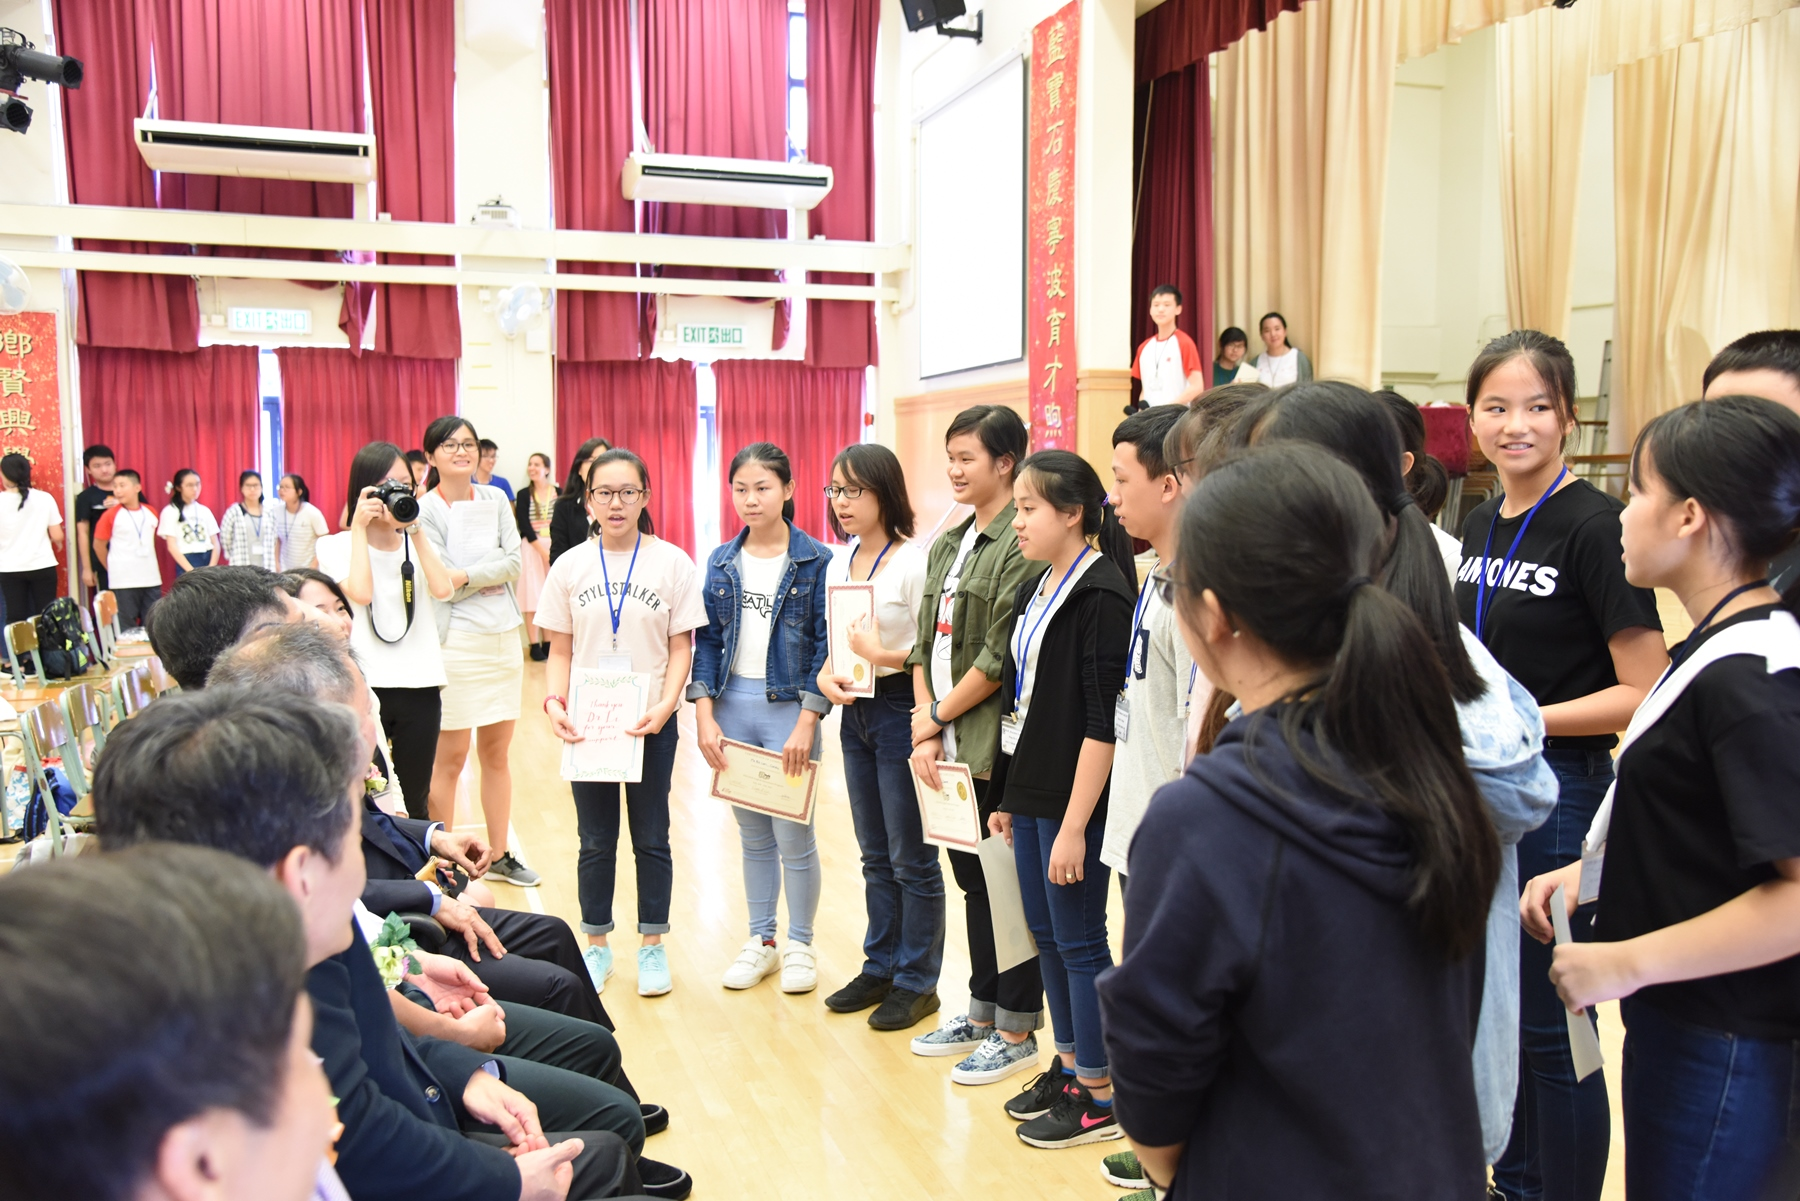 http://www.npc.edu.hk/sites/default/files/dsc_0249.jpg